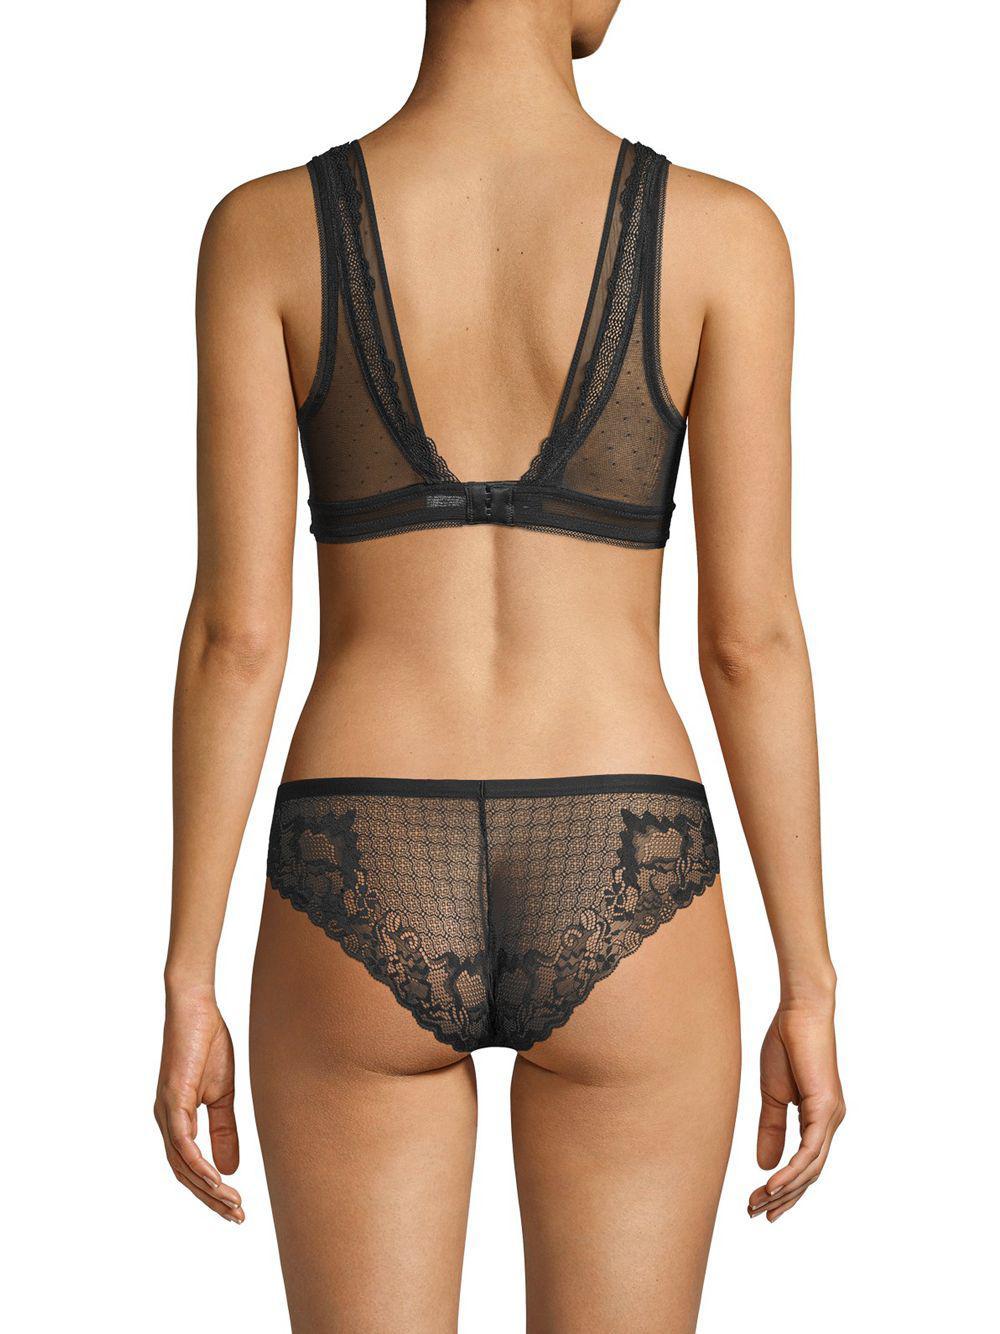 50ef1798e8 Lyst - Addiction Nouvelle Lingerie Lace And Mesh Bralette in Black